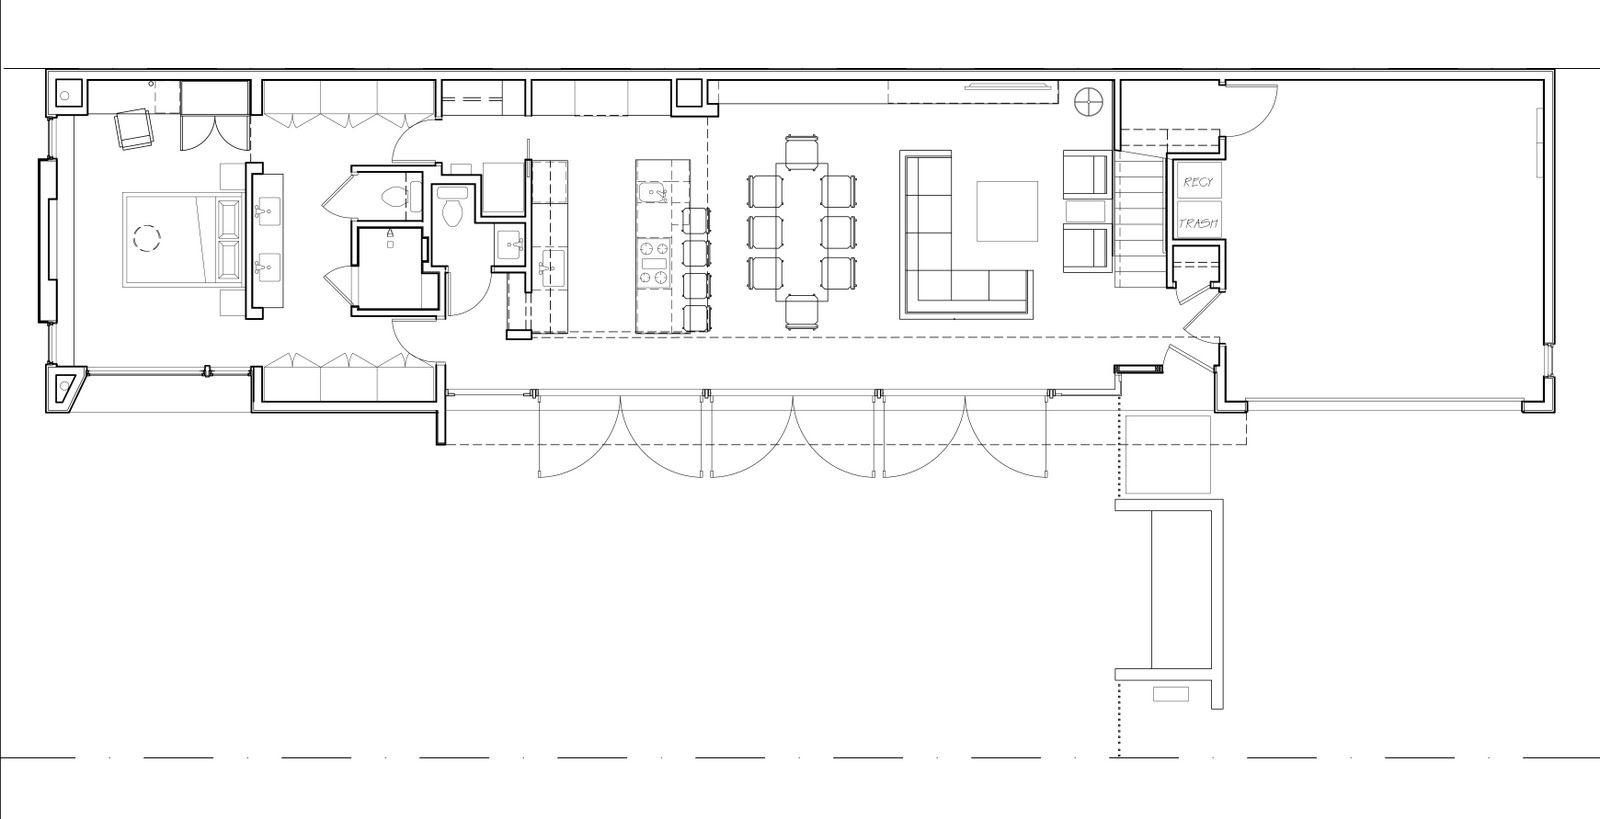 Longhouse Floor Plans Google Search Narrow House Plans House Plans How To Plan